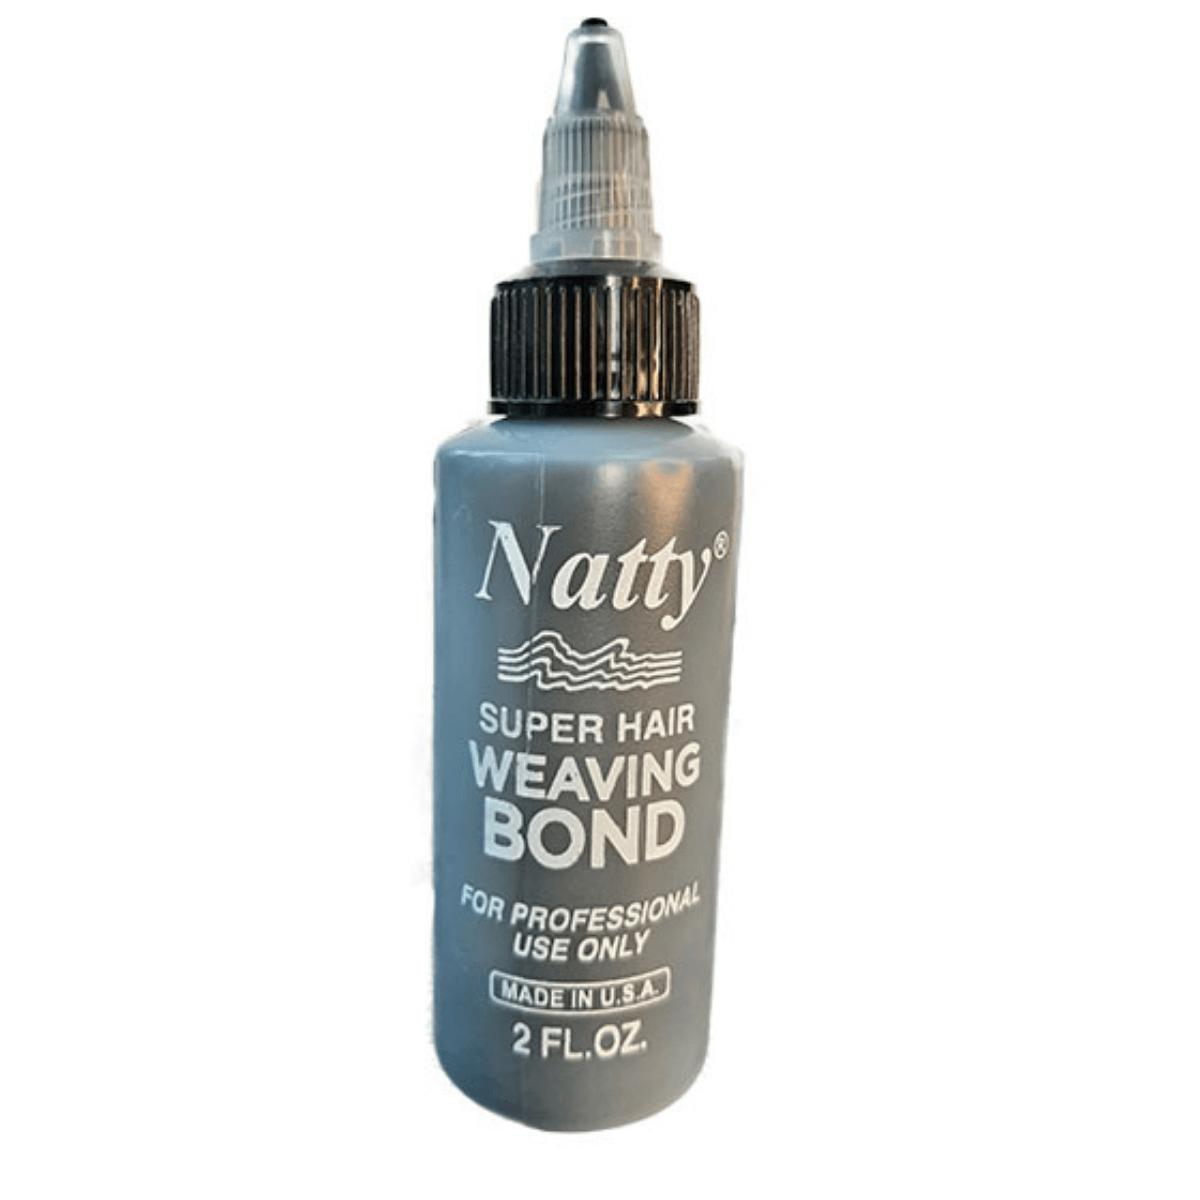 COLA NATTY - SUPER HAIR WEAVING BOND